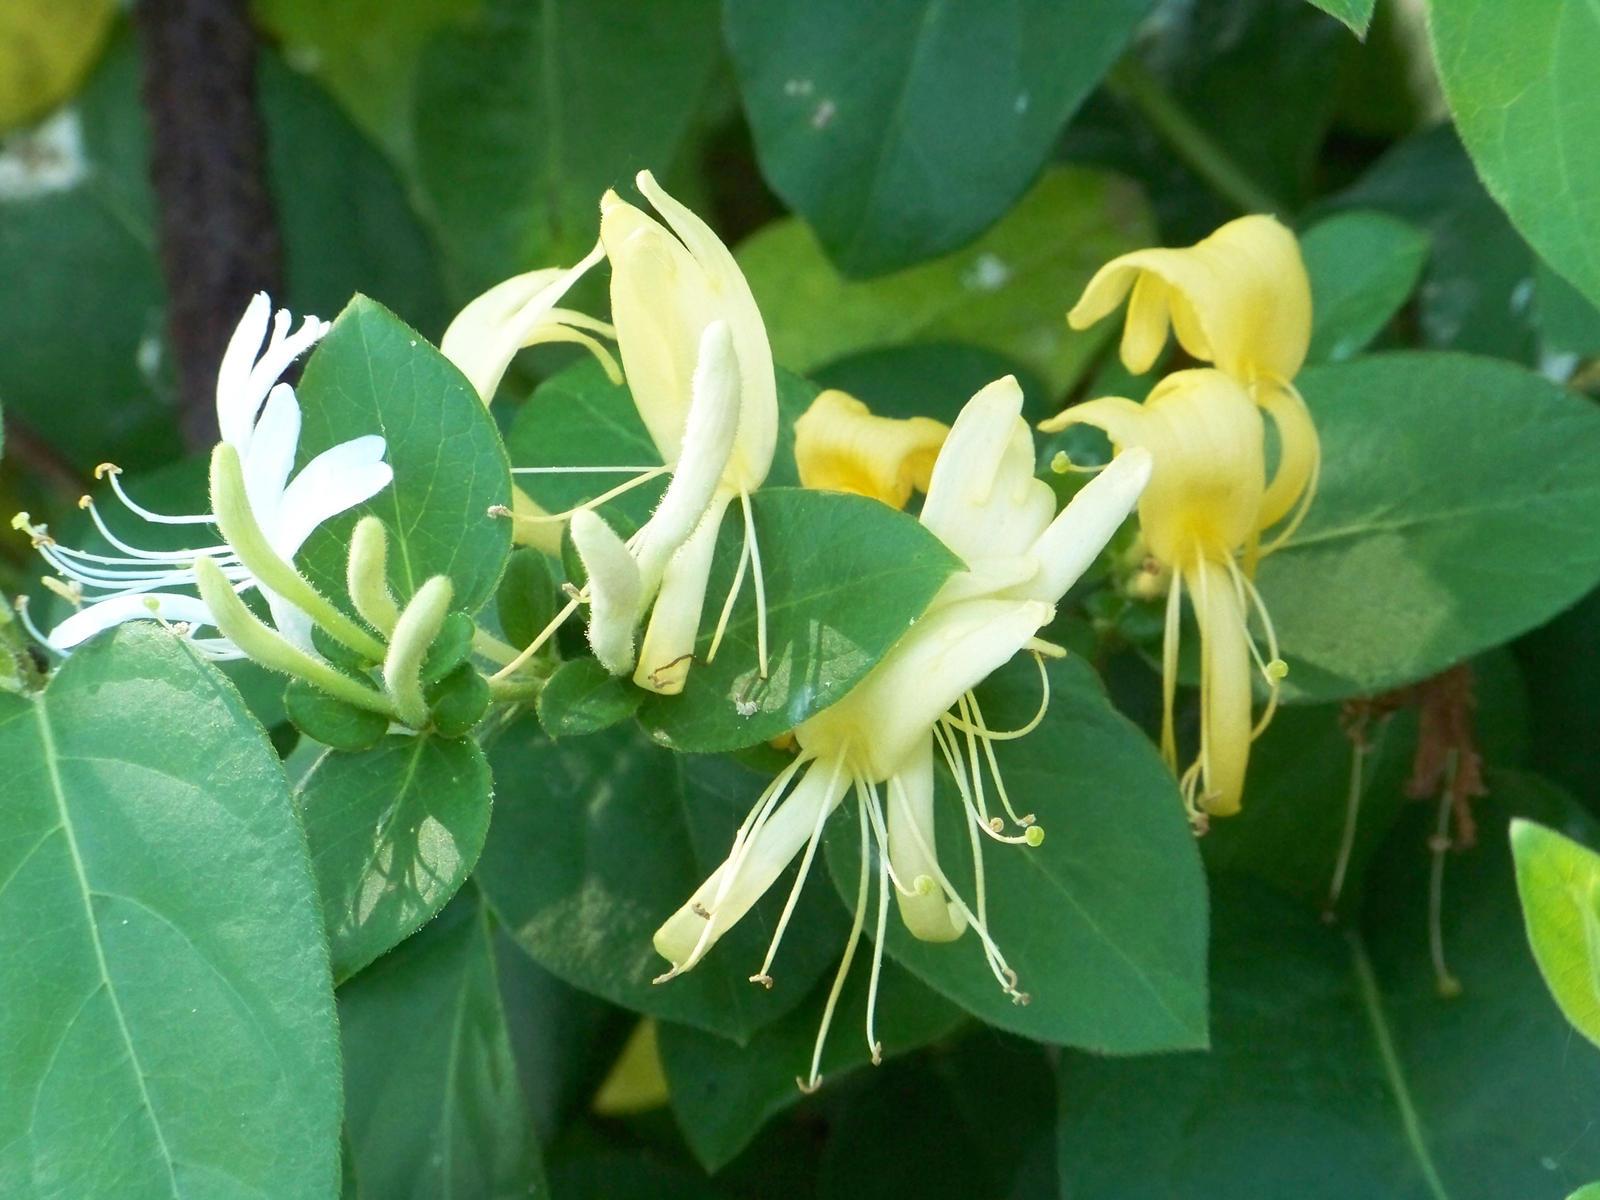 Honeysuckle Flowers IV by MadGardens on deviantART